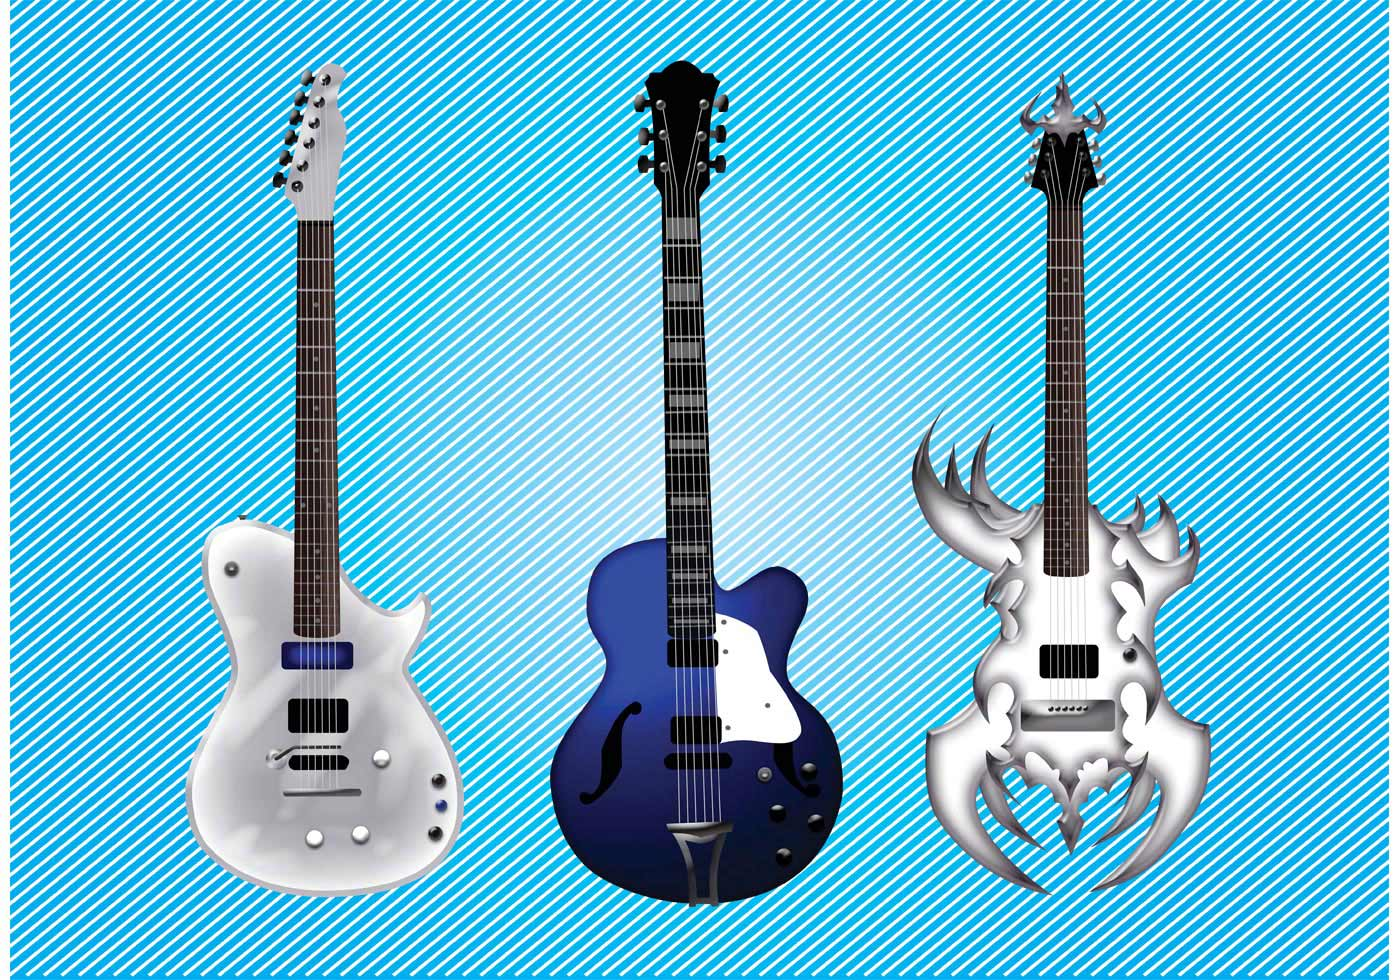 electric guitar vectors download free vector art stock graphics images. Black Bedroom Furniture Sets. Home Design Ideas